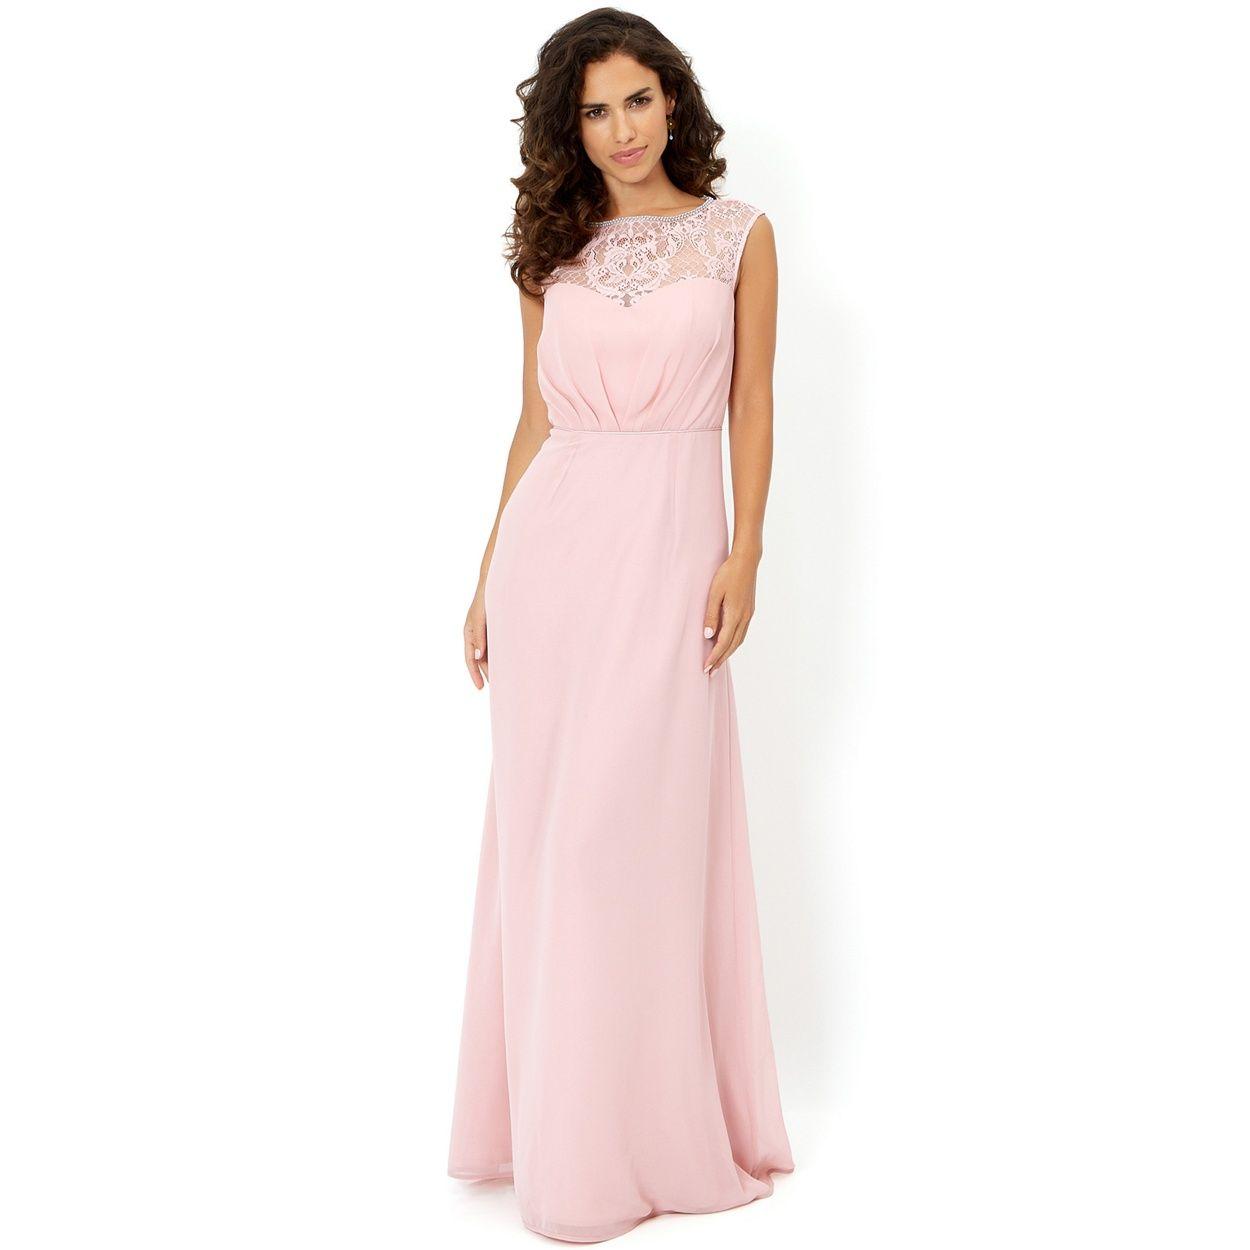 Monsoon pink maisie maxi dress debenhams bridesmaid dresses monsoon pink maisie maxi dress debenhams ombrellifo Gallery